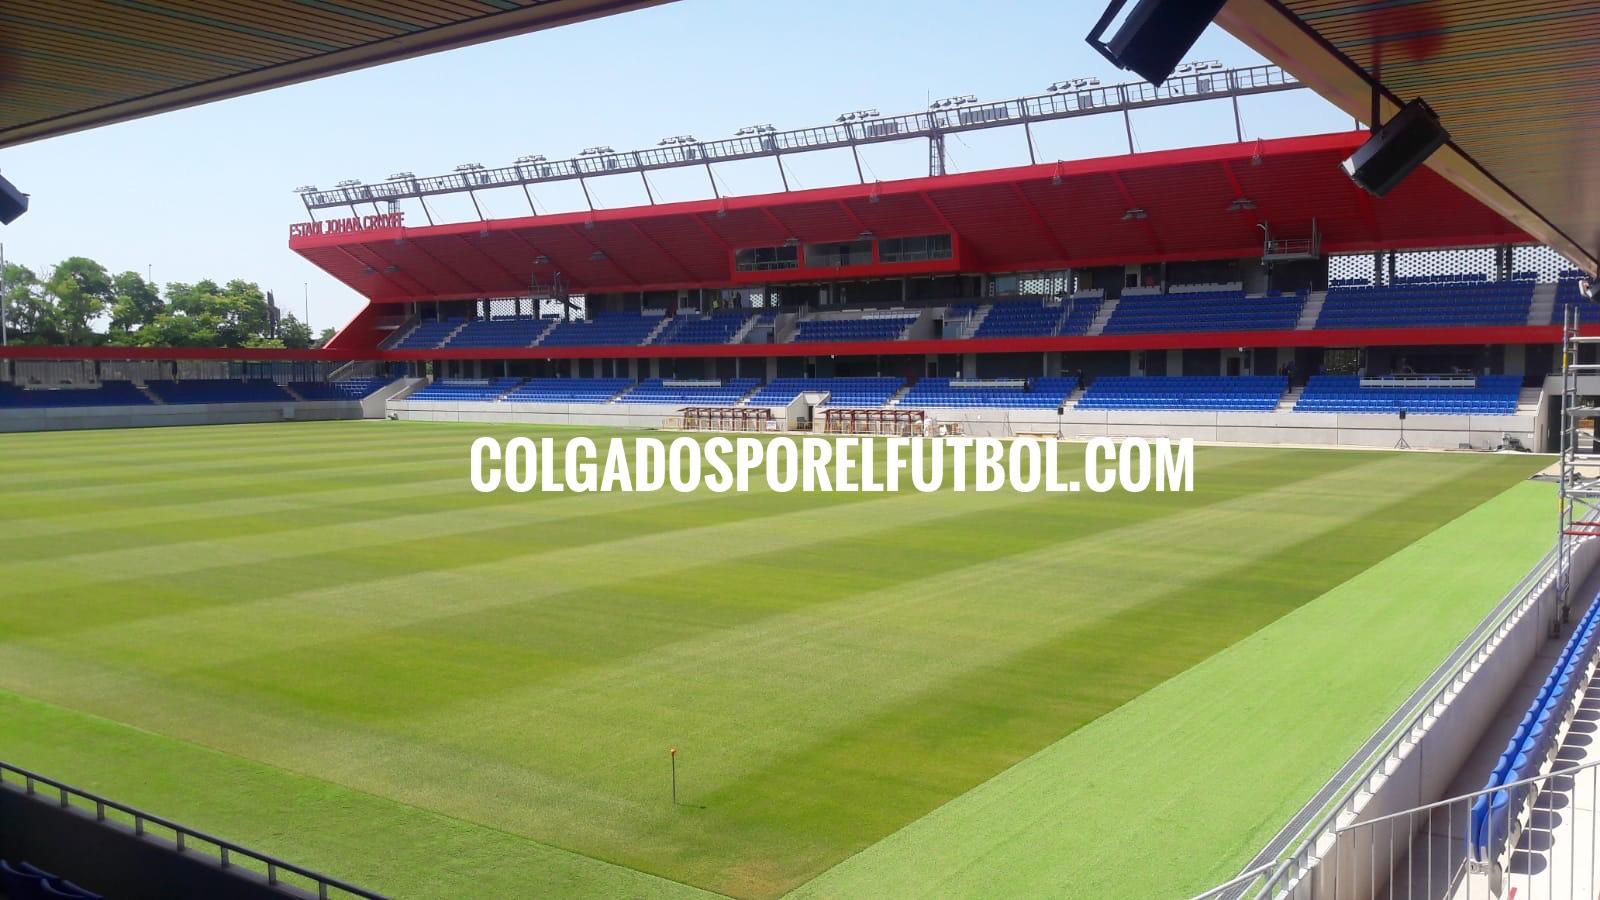 Johan Cruyff Stadium